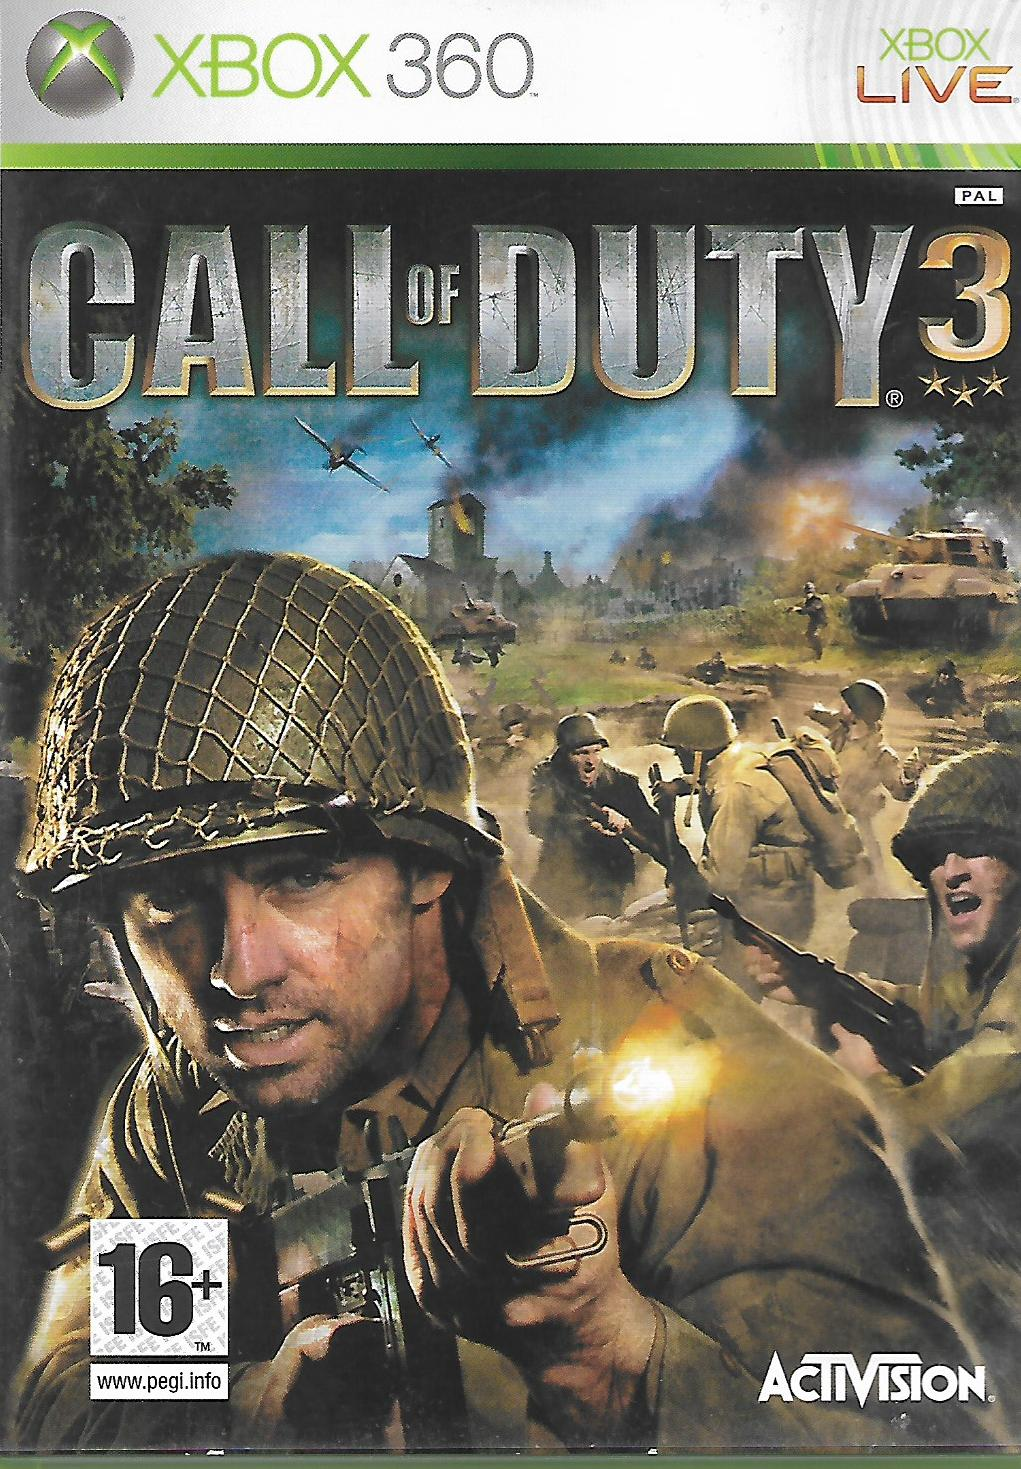 CALL OF DUTY 3 (XBOX 360 - bazar)